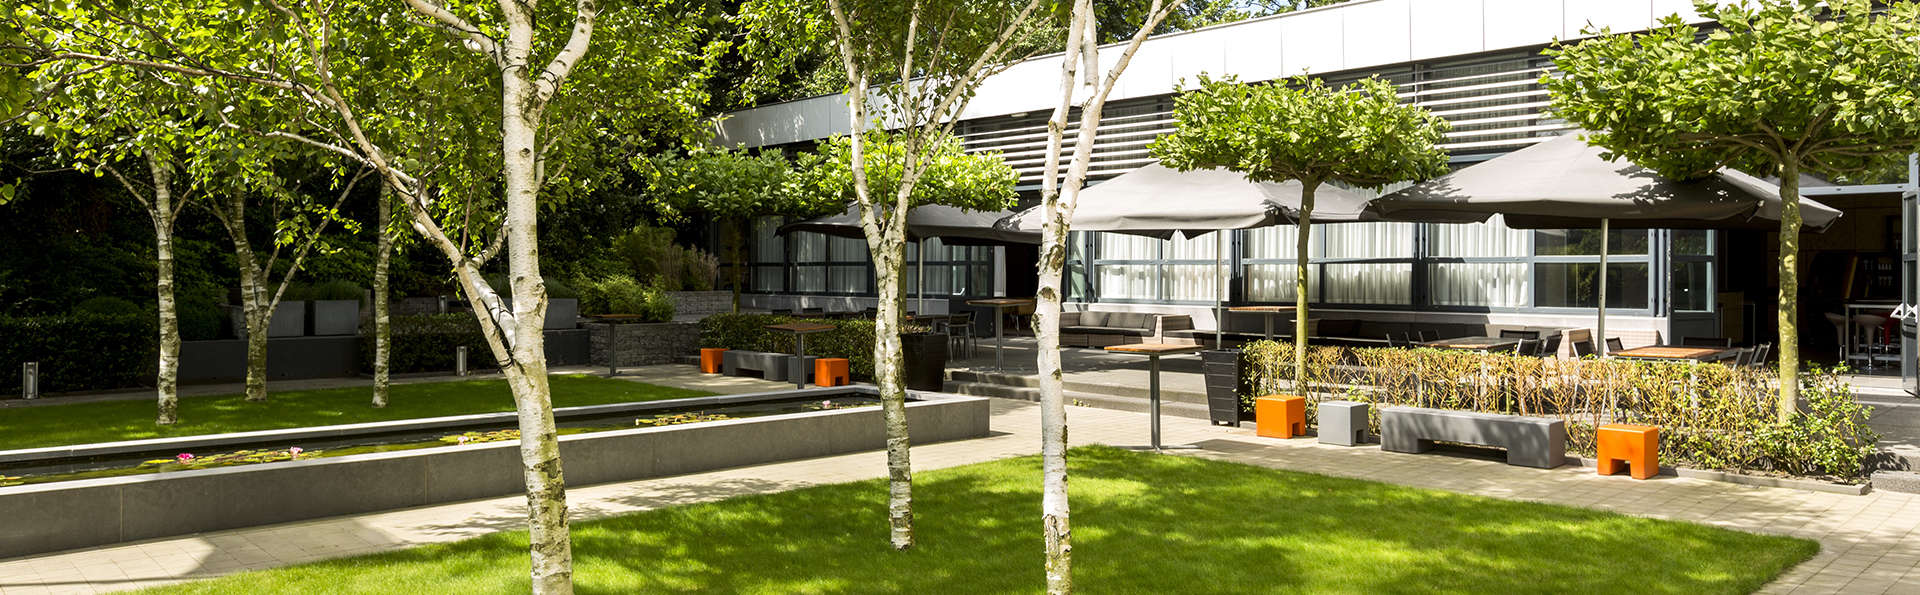 Marriott Hotel The Hague  - EDIT_MH_RTMMC_garden.jpg